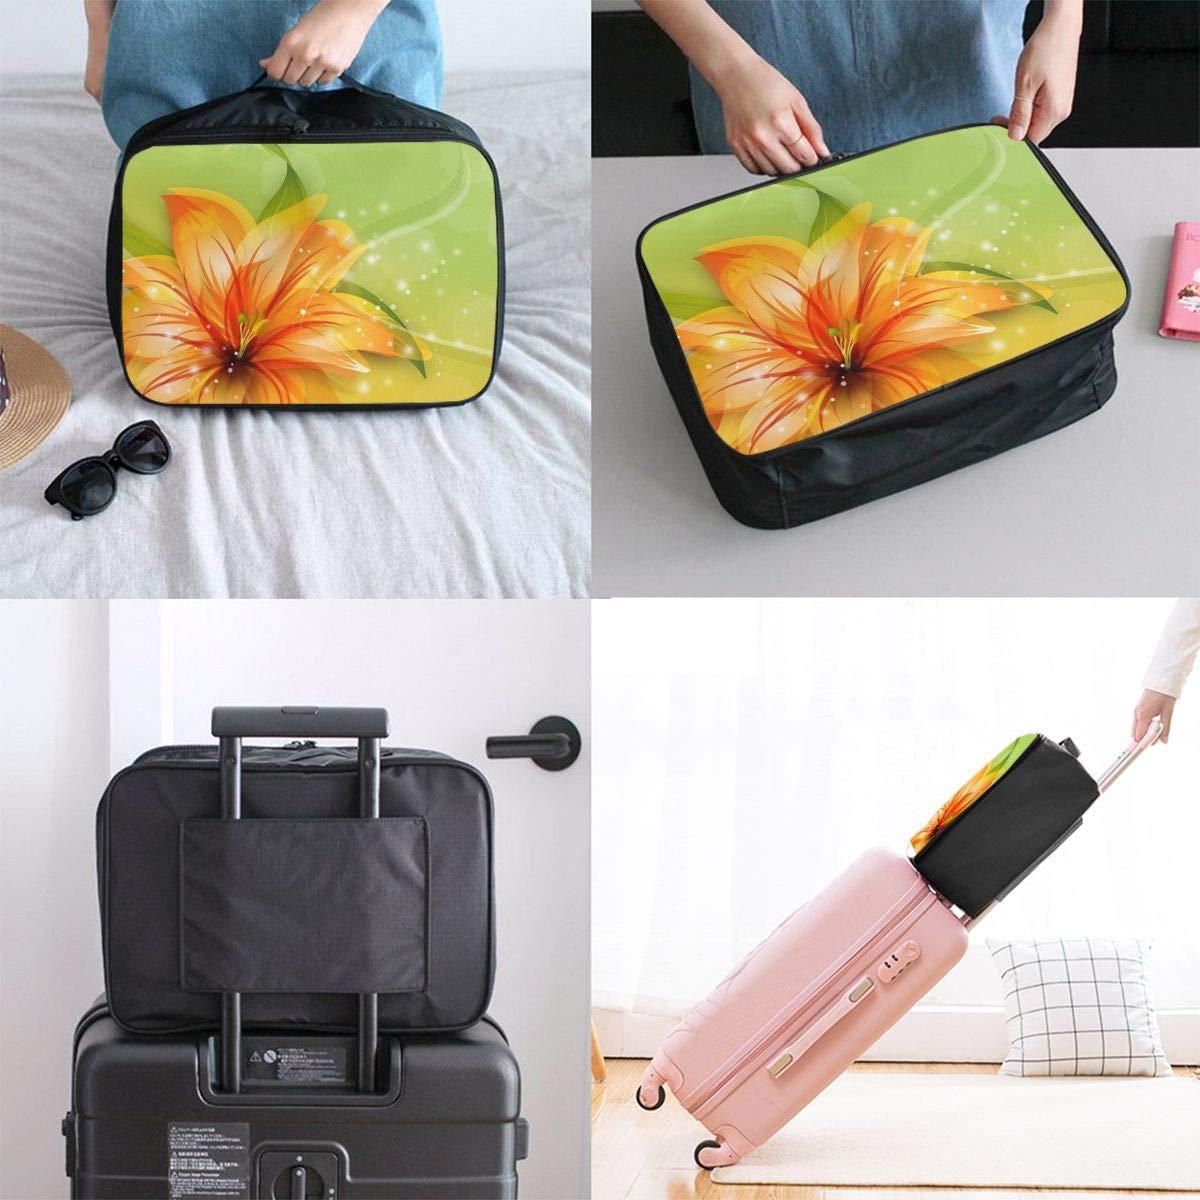 JTRVW Luggage Bags for Travel Lightweight Large Capacity Portable Duffel Bag for Men /& Women Orange Lilies Travel Duffel Bag Backpack